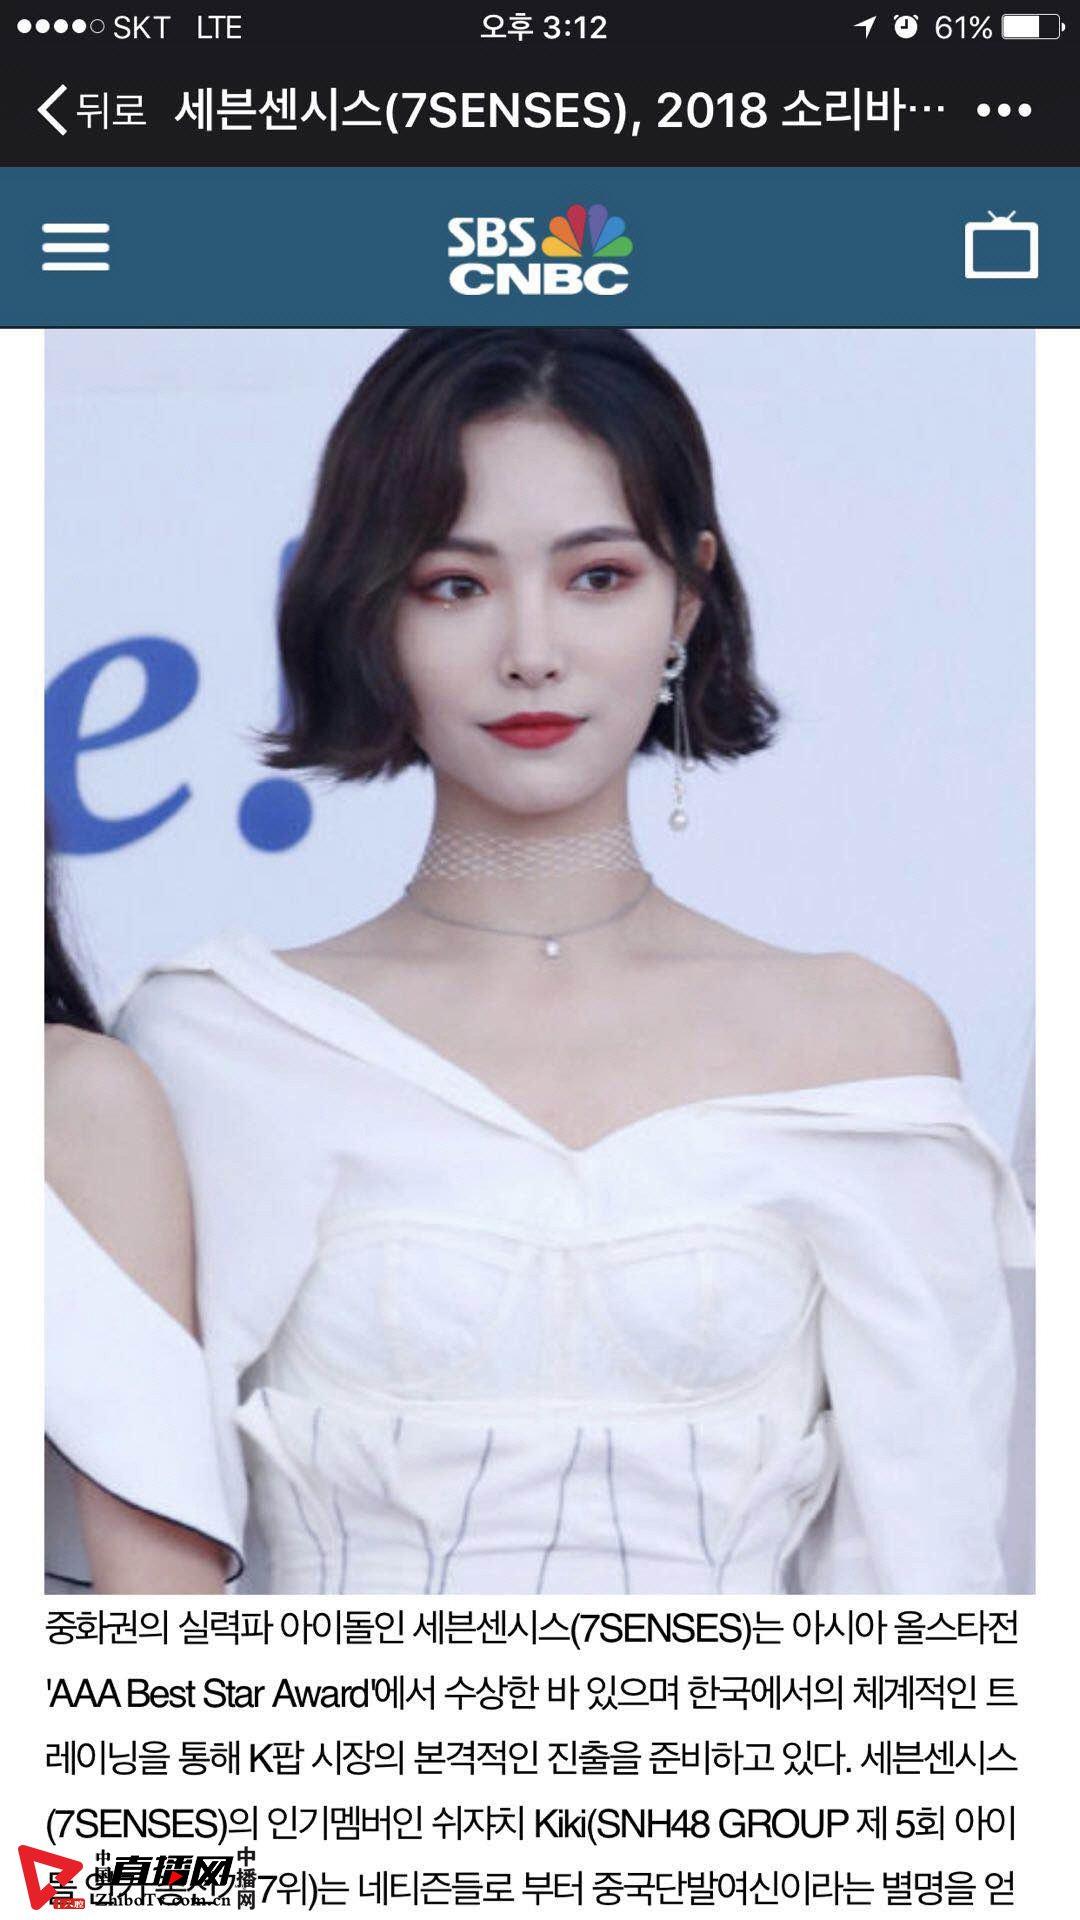 SNH48 7SENSES获新韩流海外艺人奖 被誉为中国女团界C位